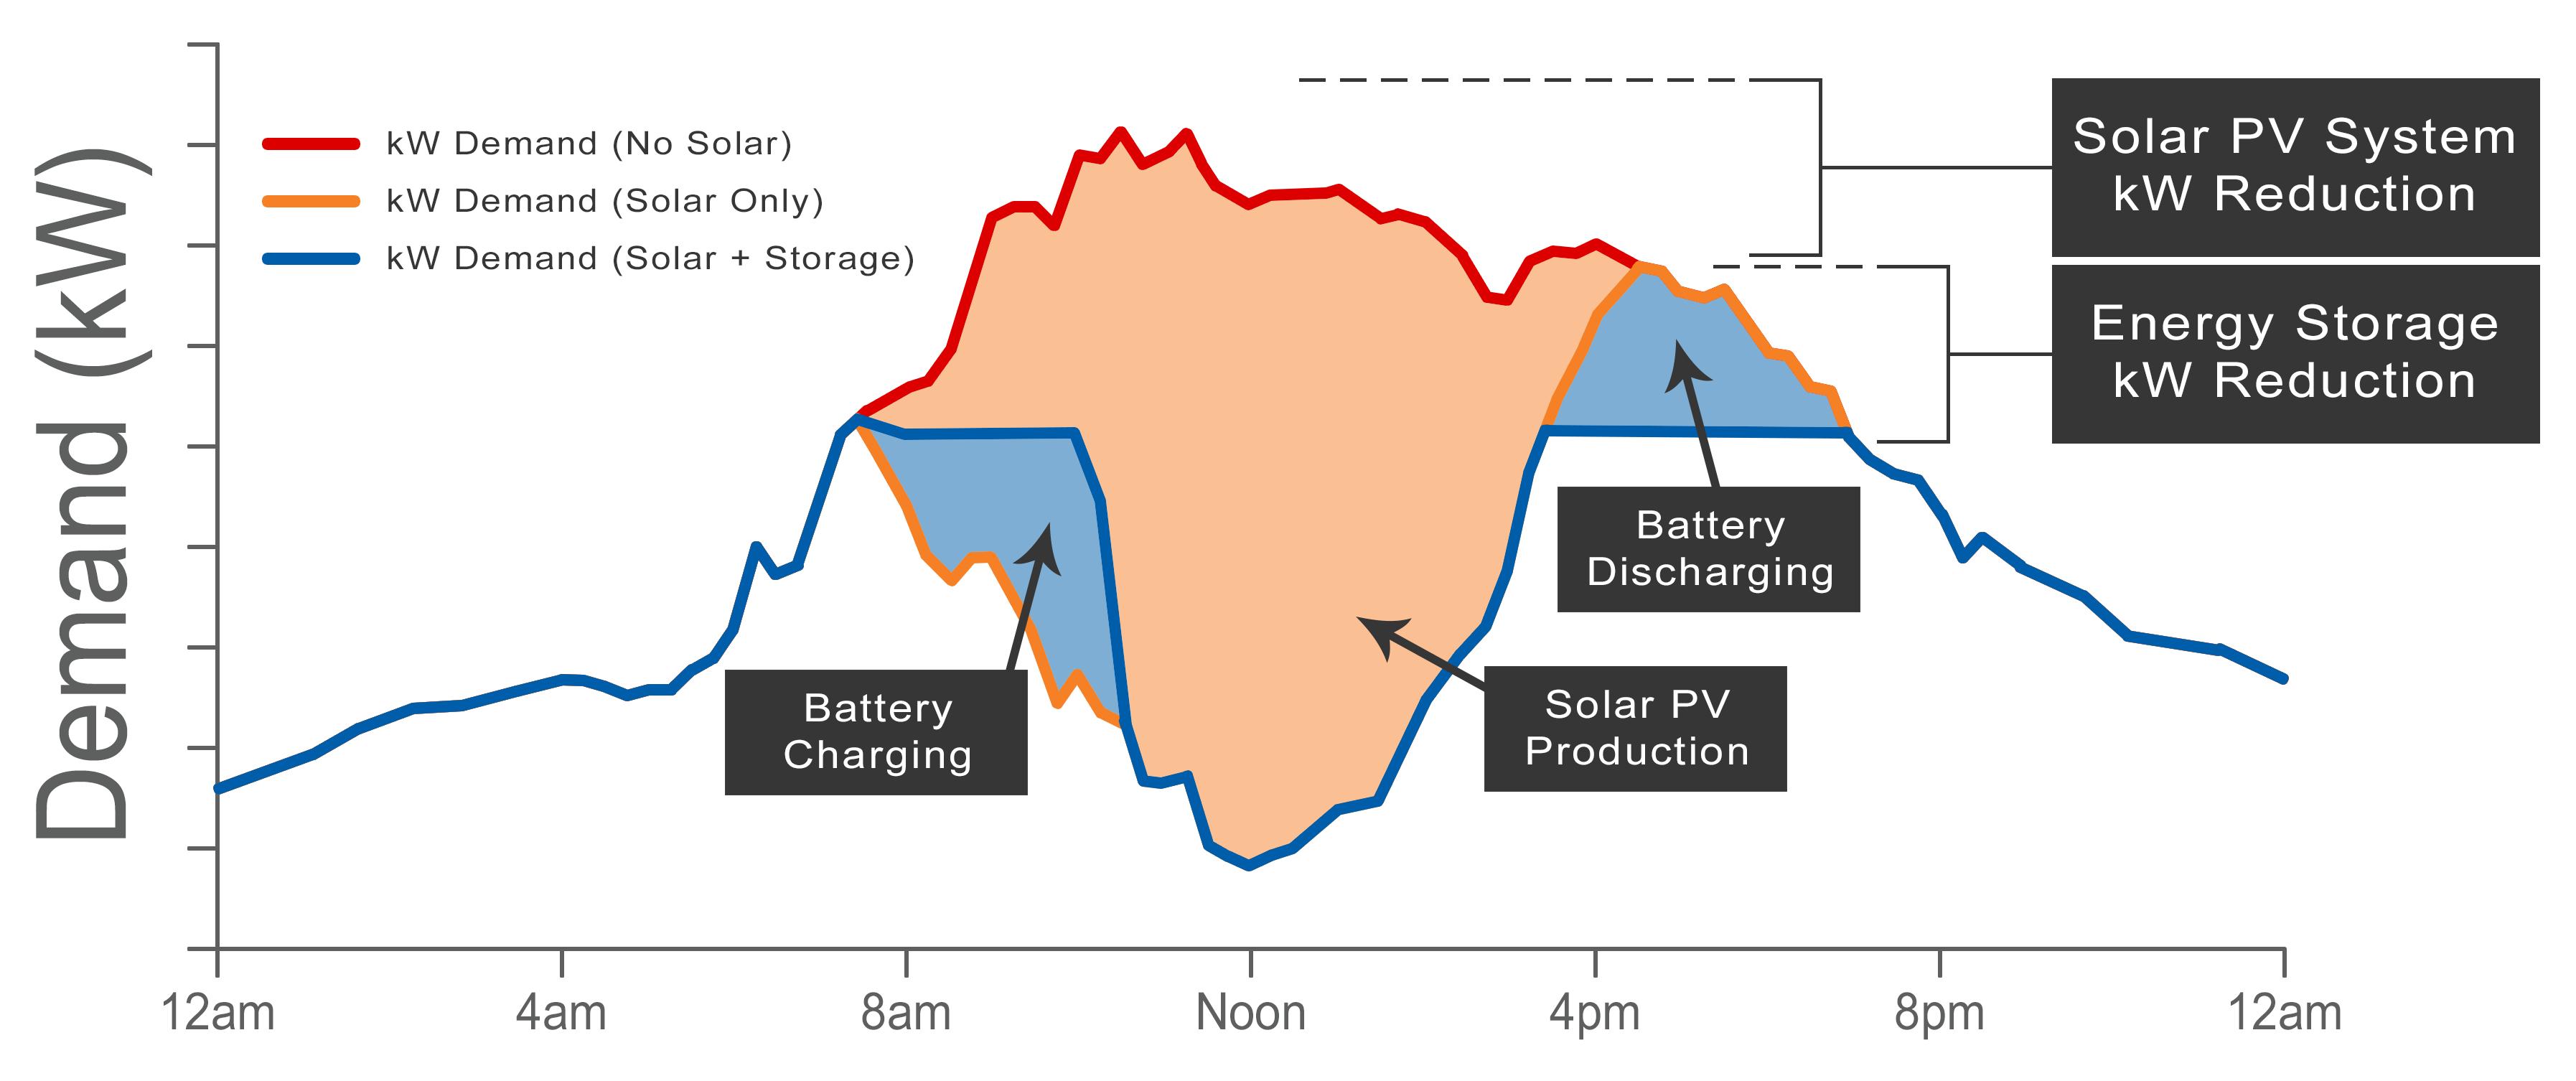 Demand Reduction with Solar + Storage